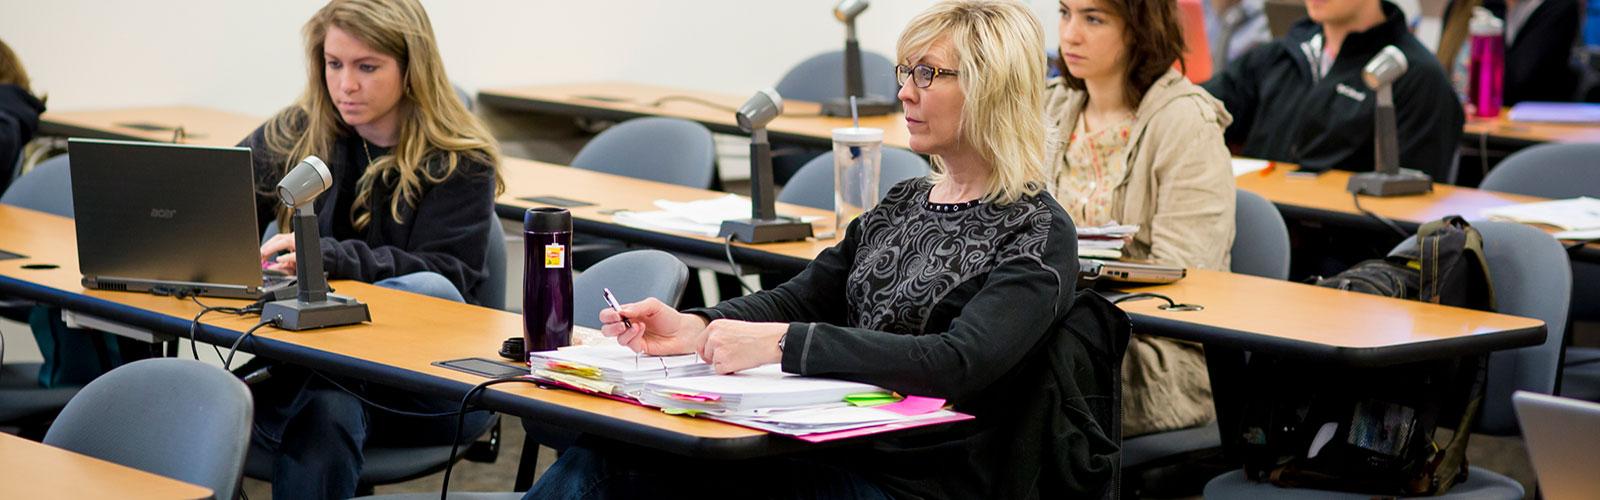 Creighton University Adult Learner